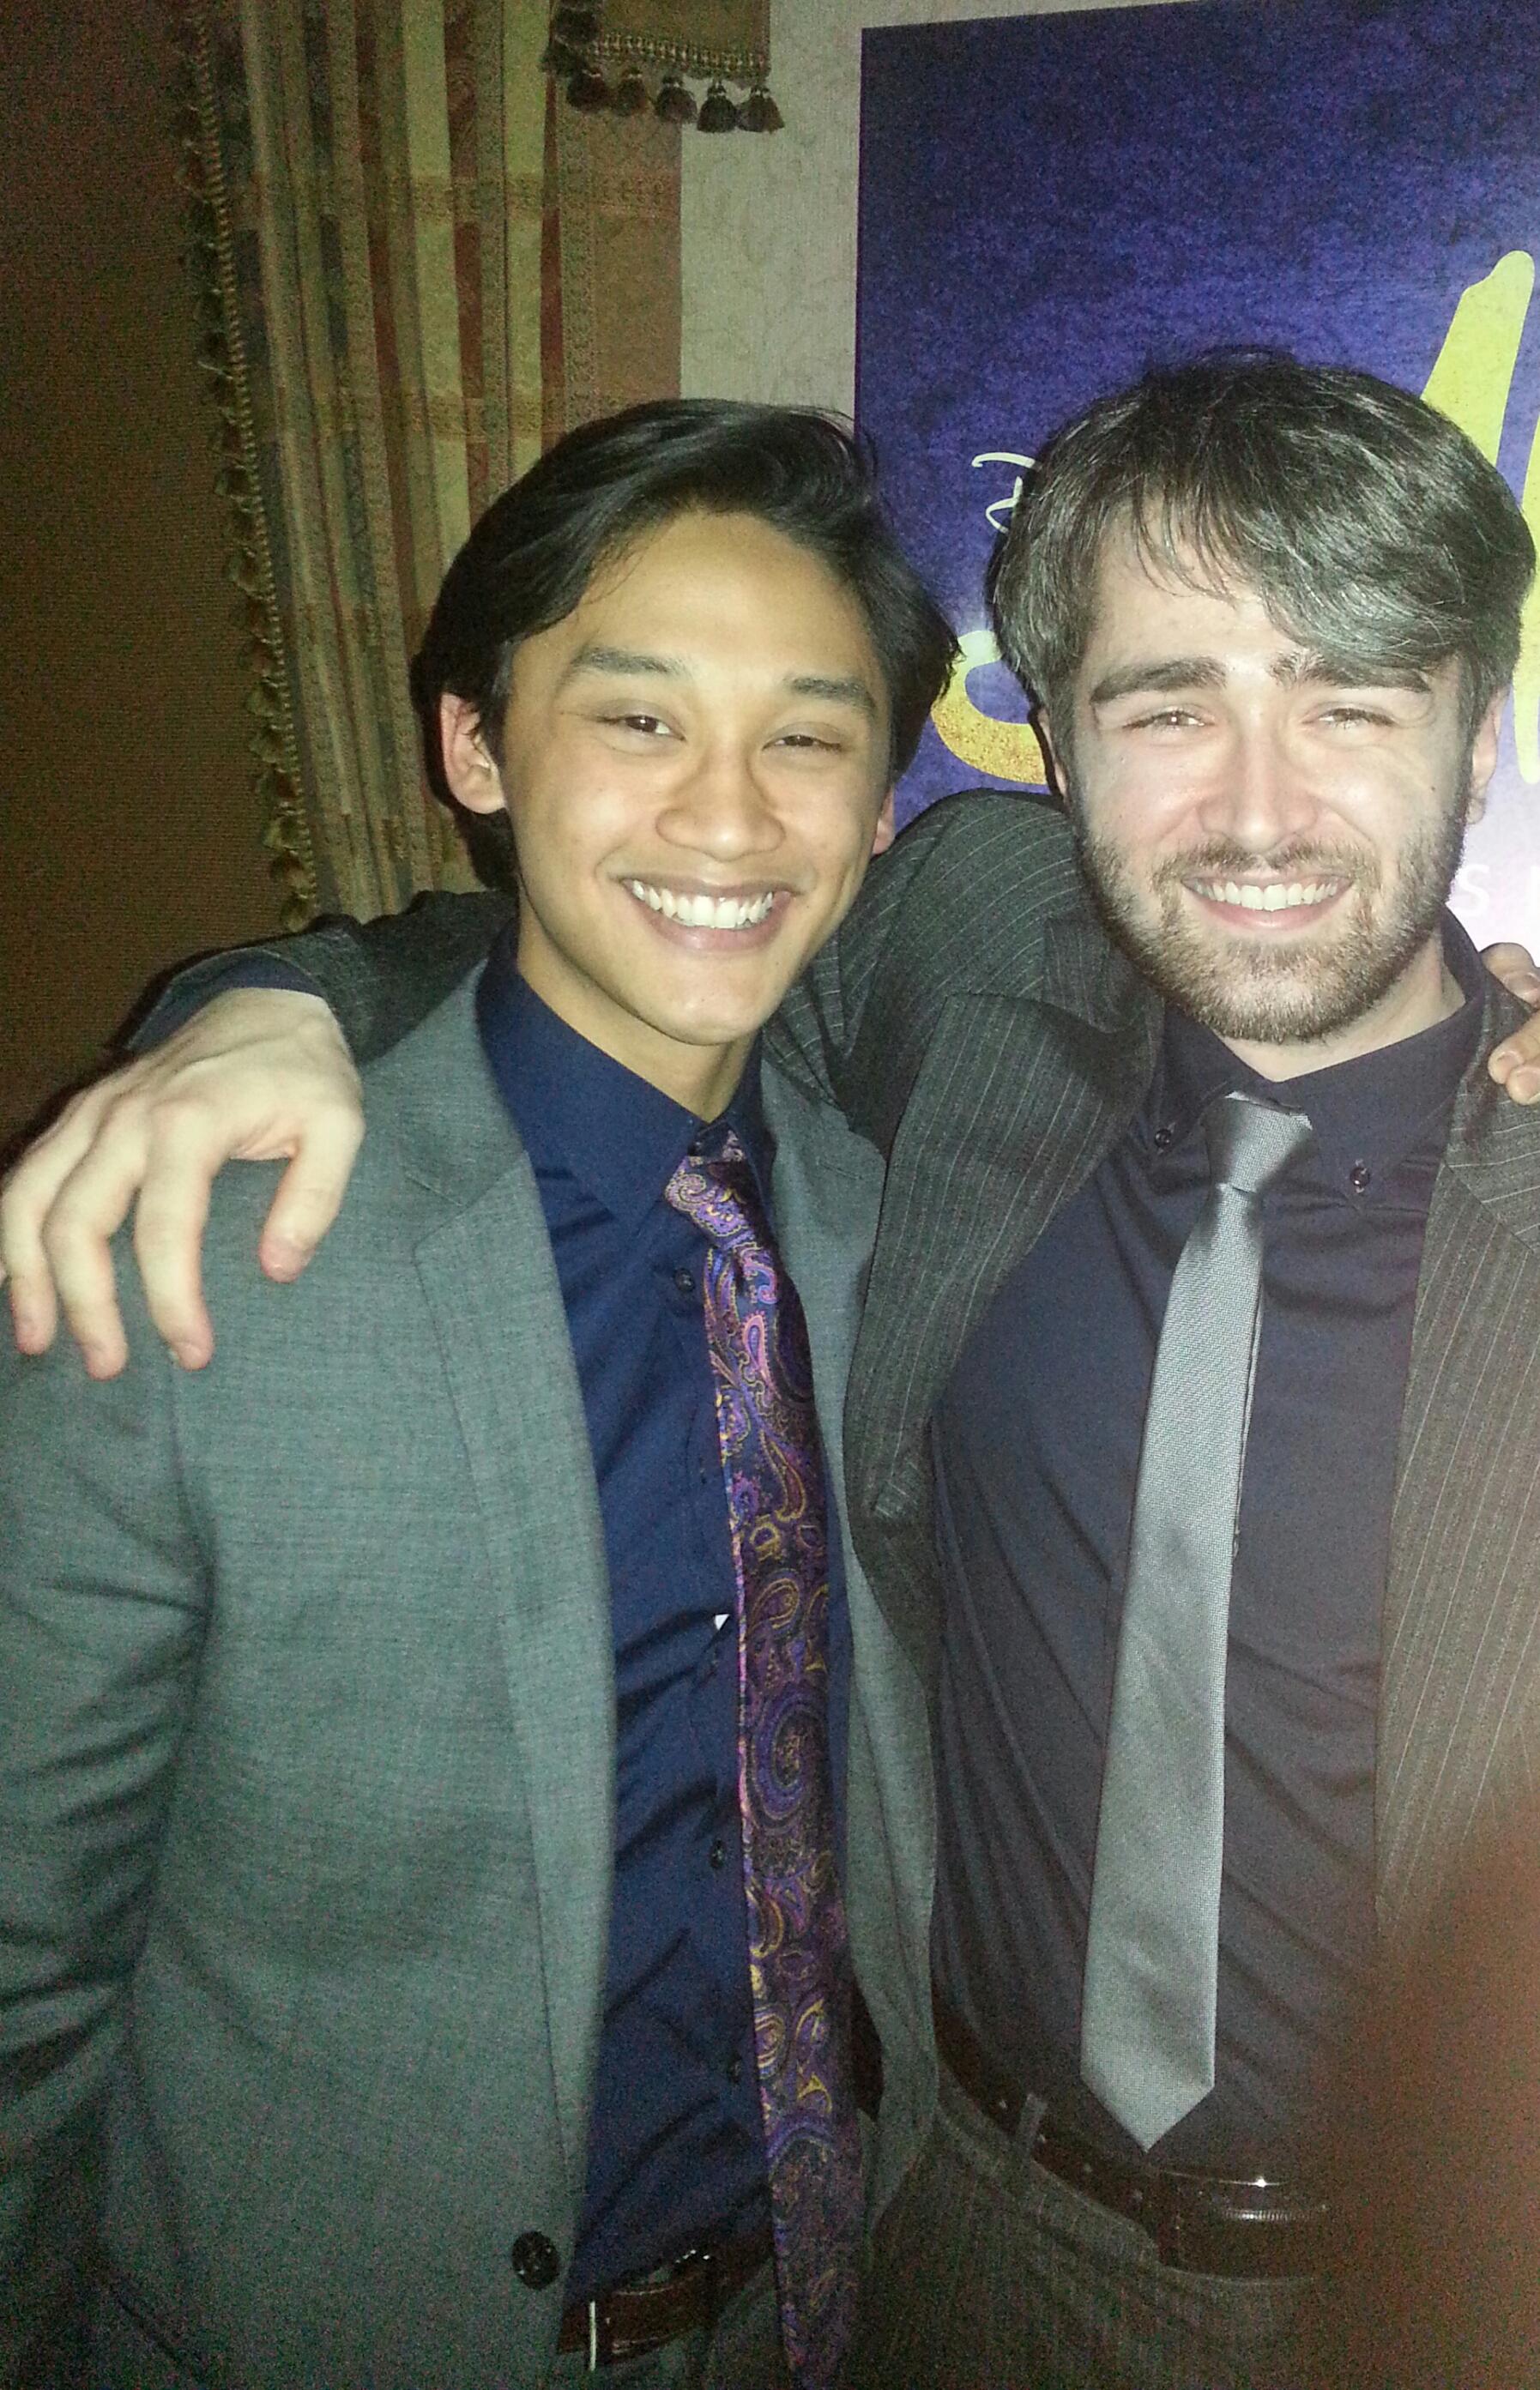 Joshua Dela Cruz and Mitch at the Aladdin Broadway Premiere Party